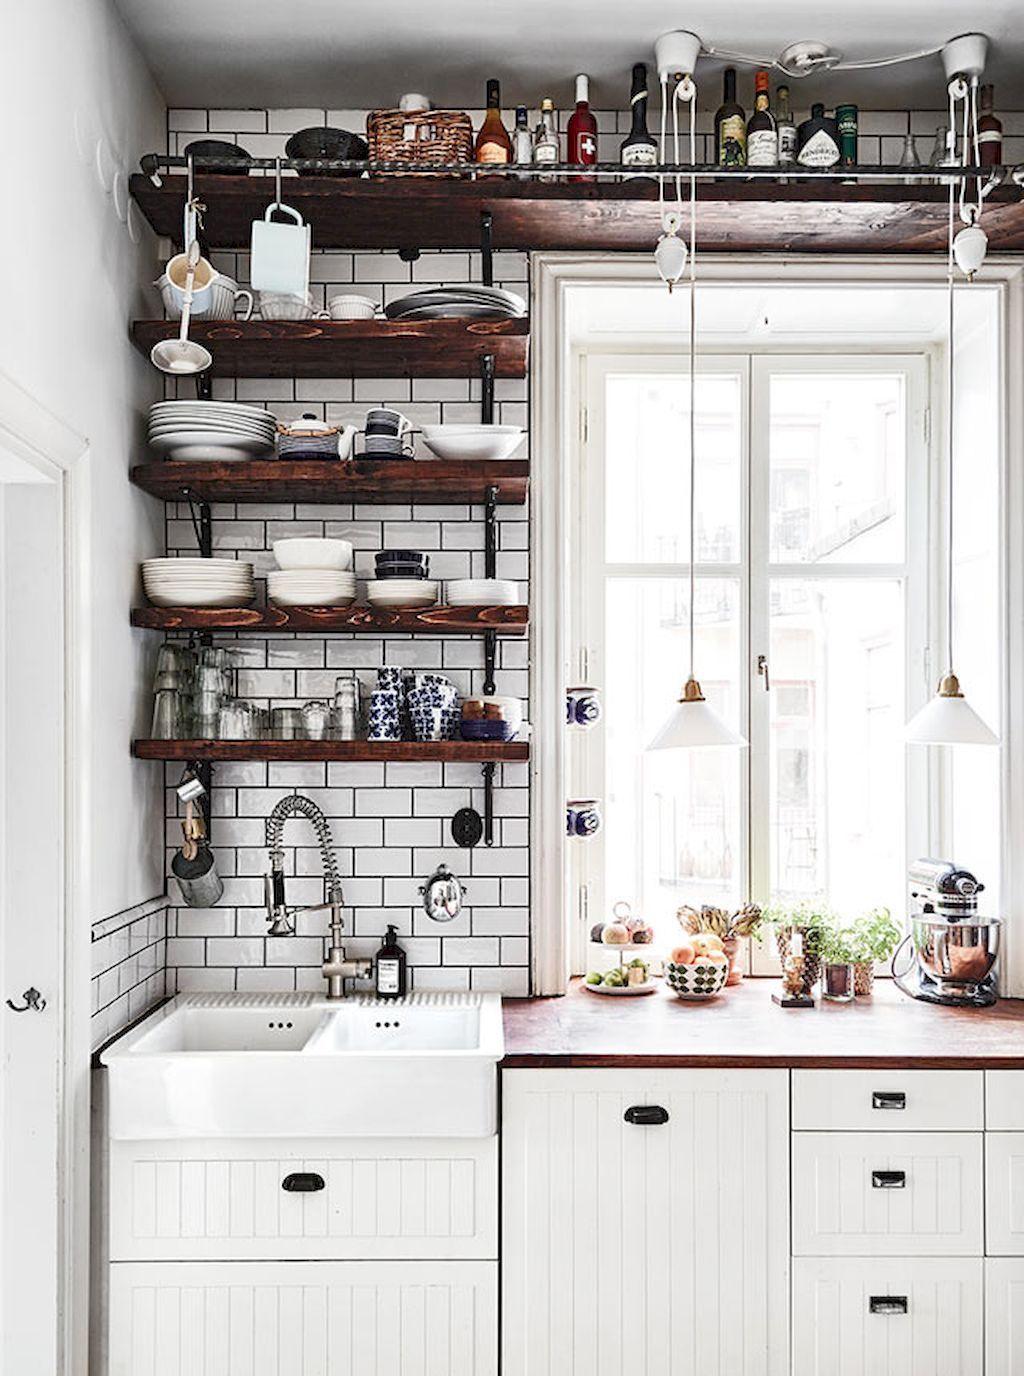 Genius tiny house kitchen ideas (17 | Tiny houses, Kitchens and House